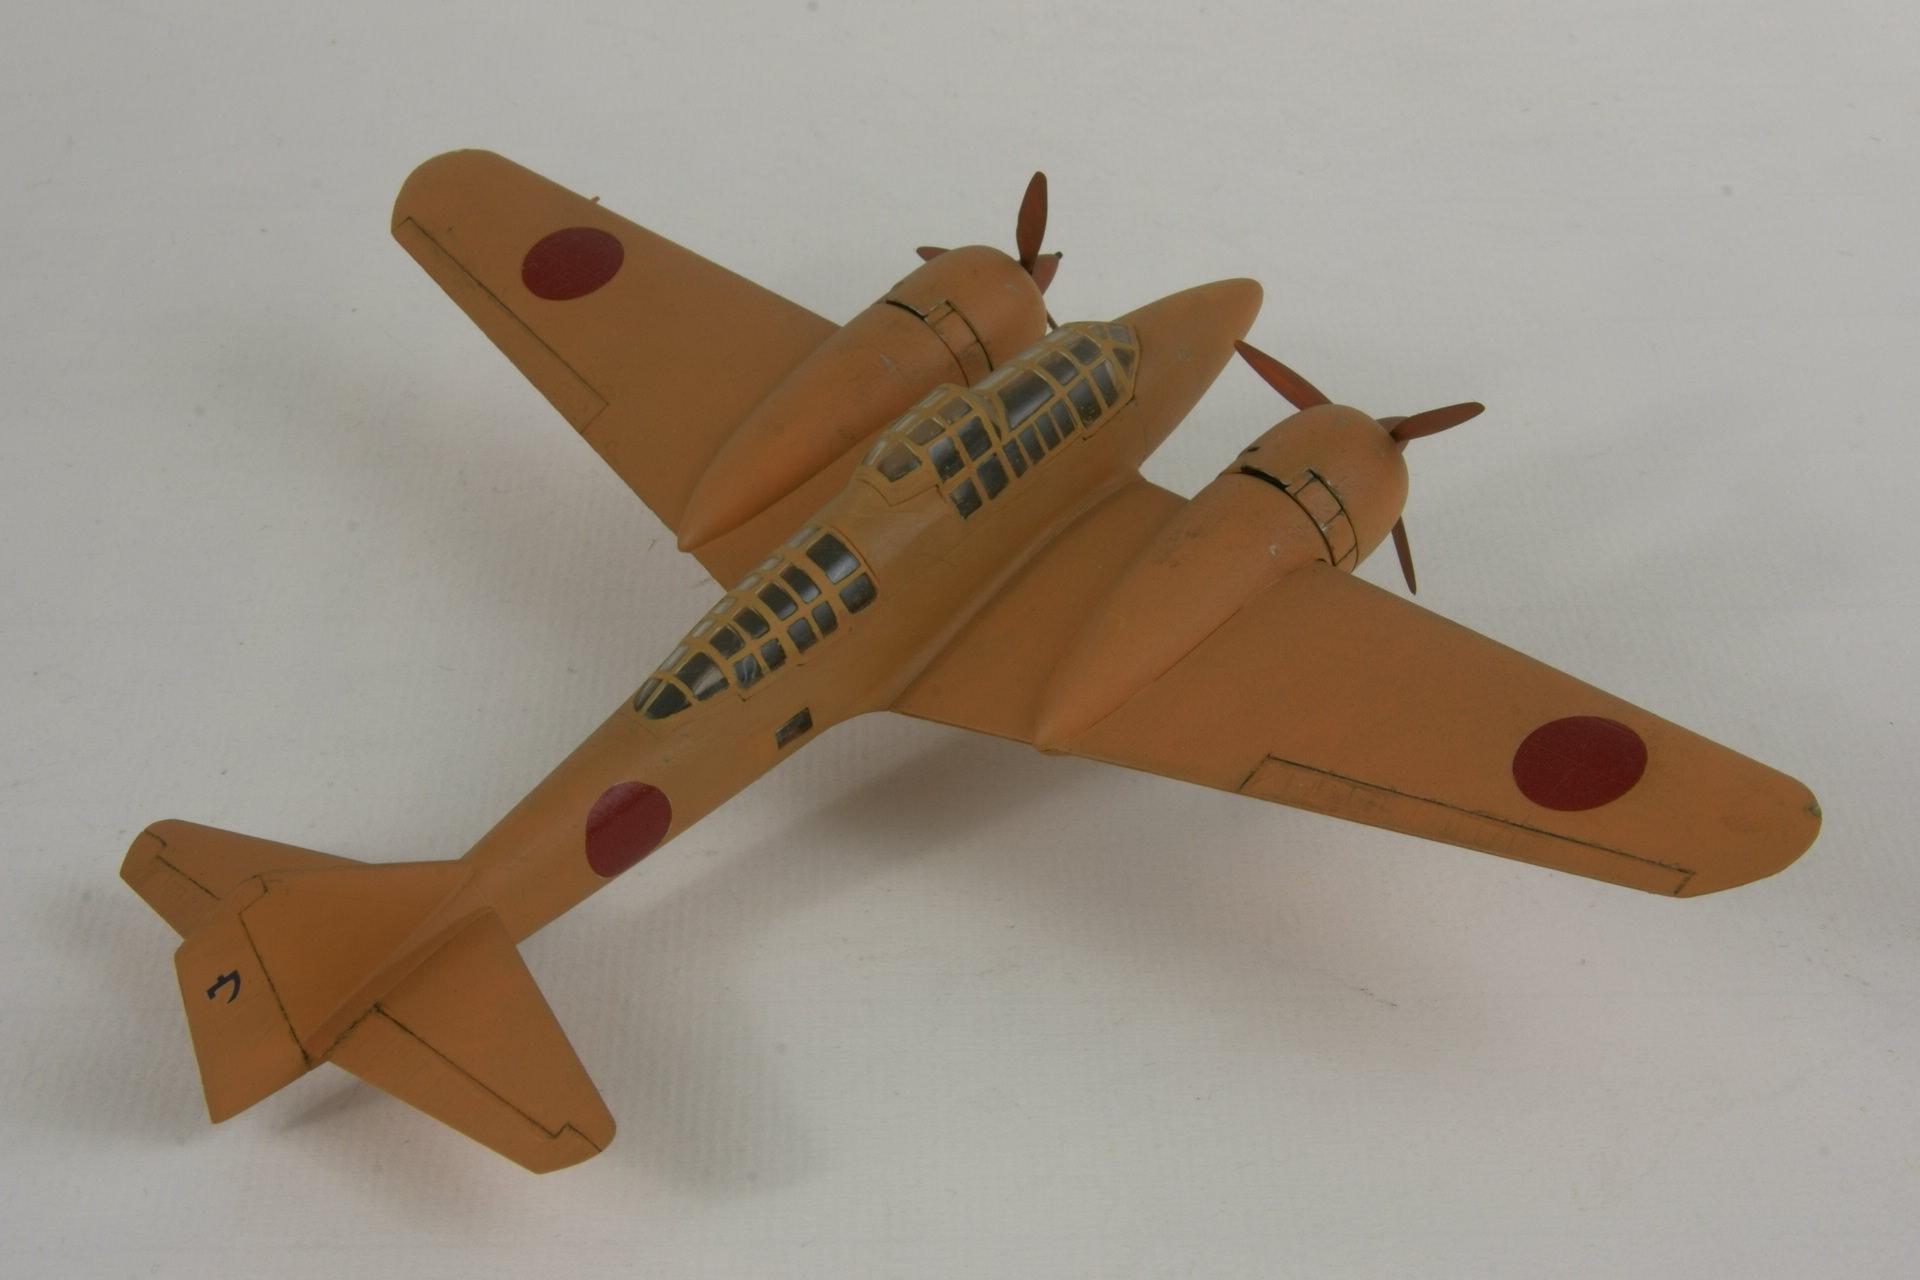 Mitsubishi ki 46 ii type 100 dinah 3 1